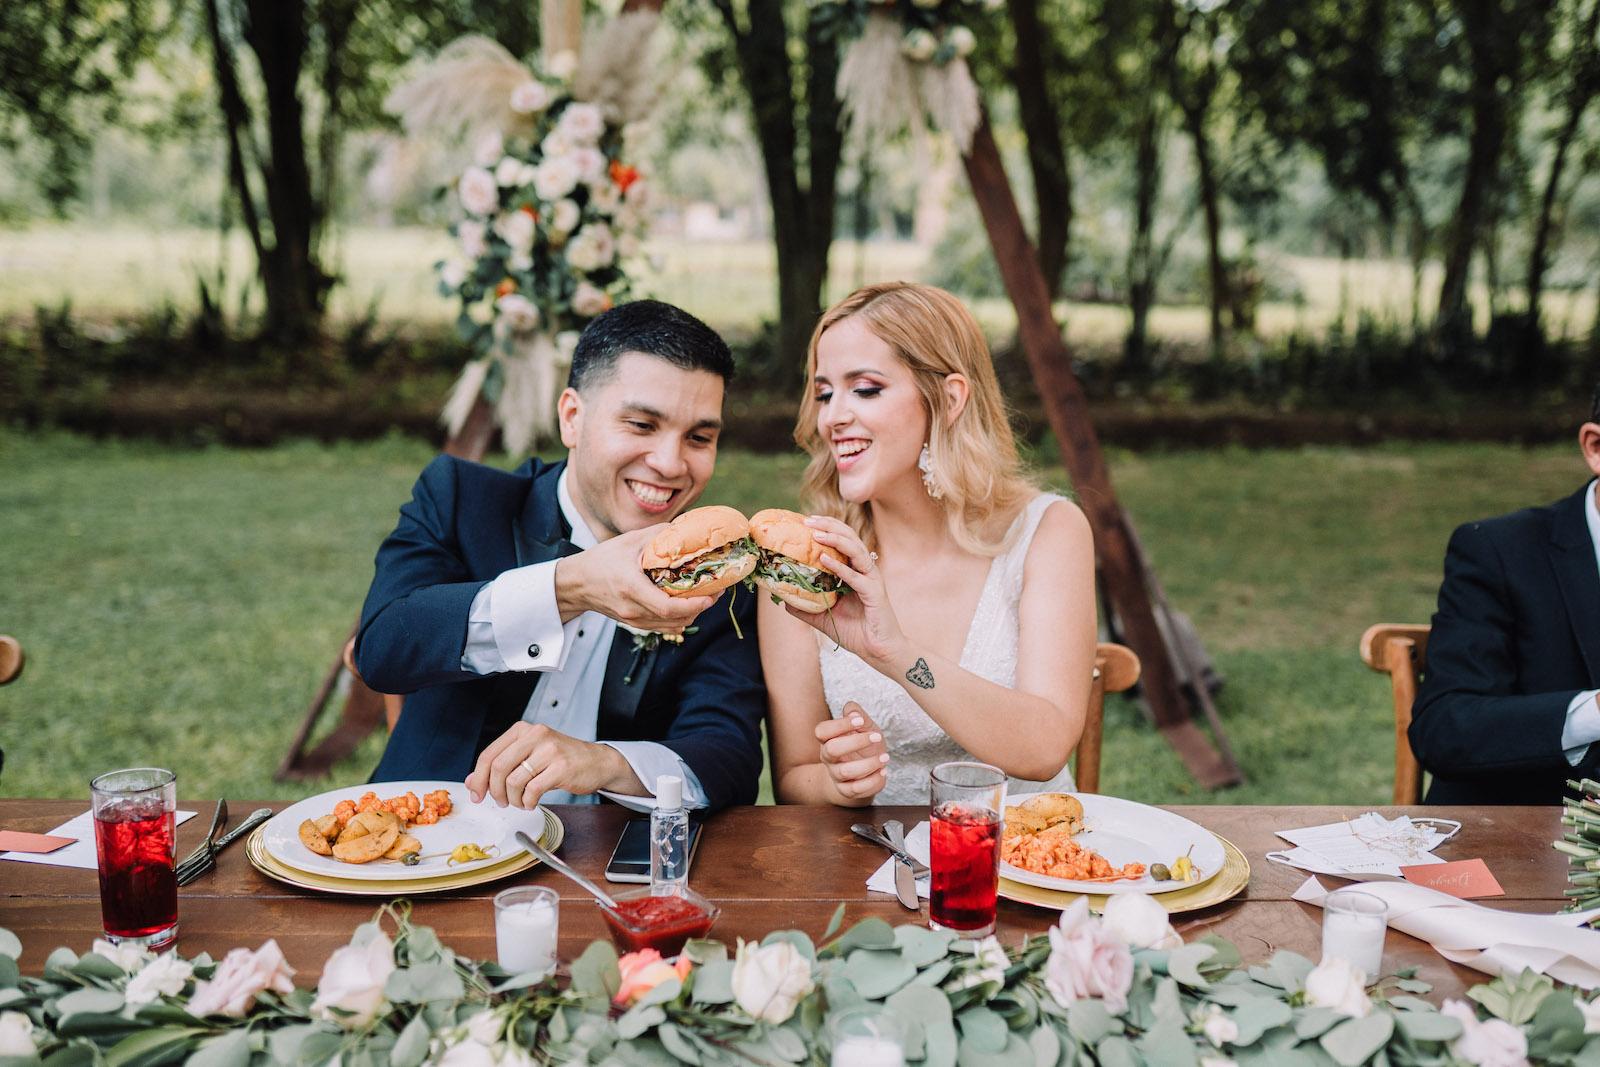 Vainilla Wedding Planners